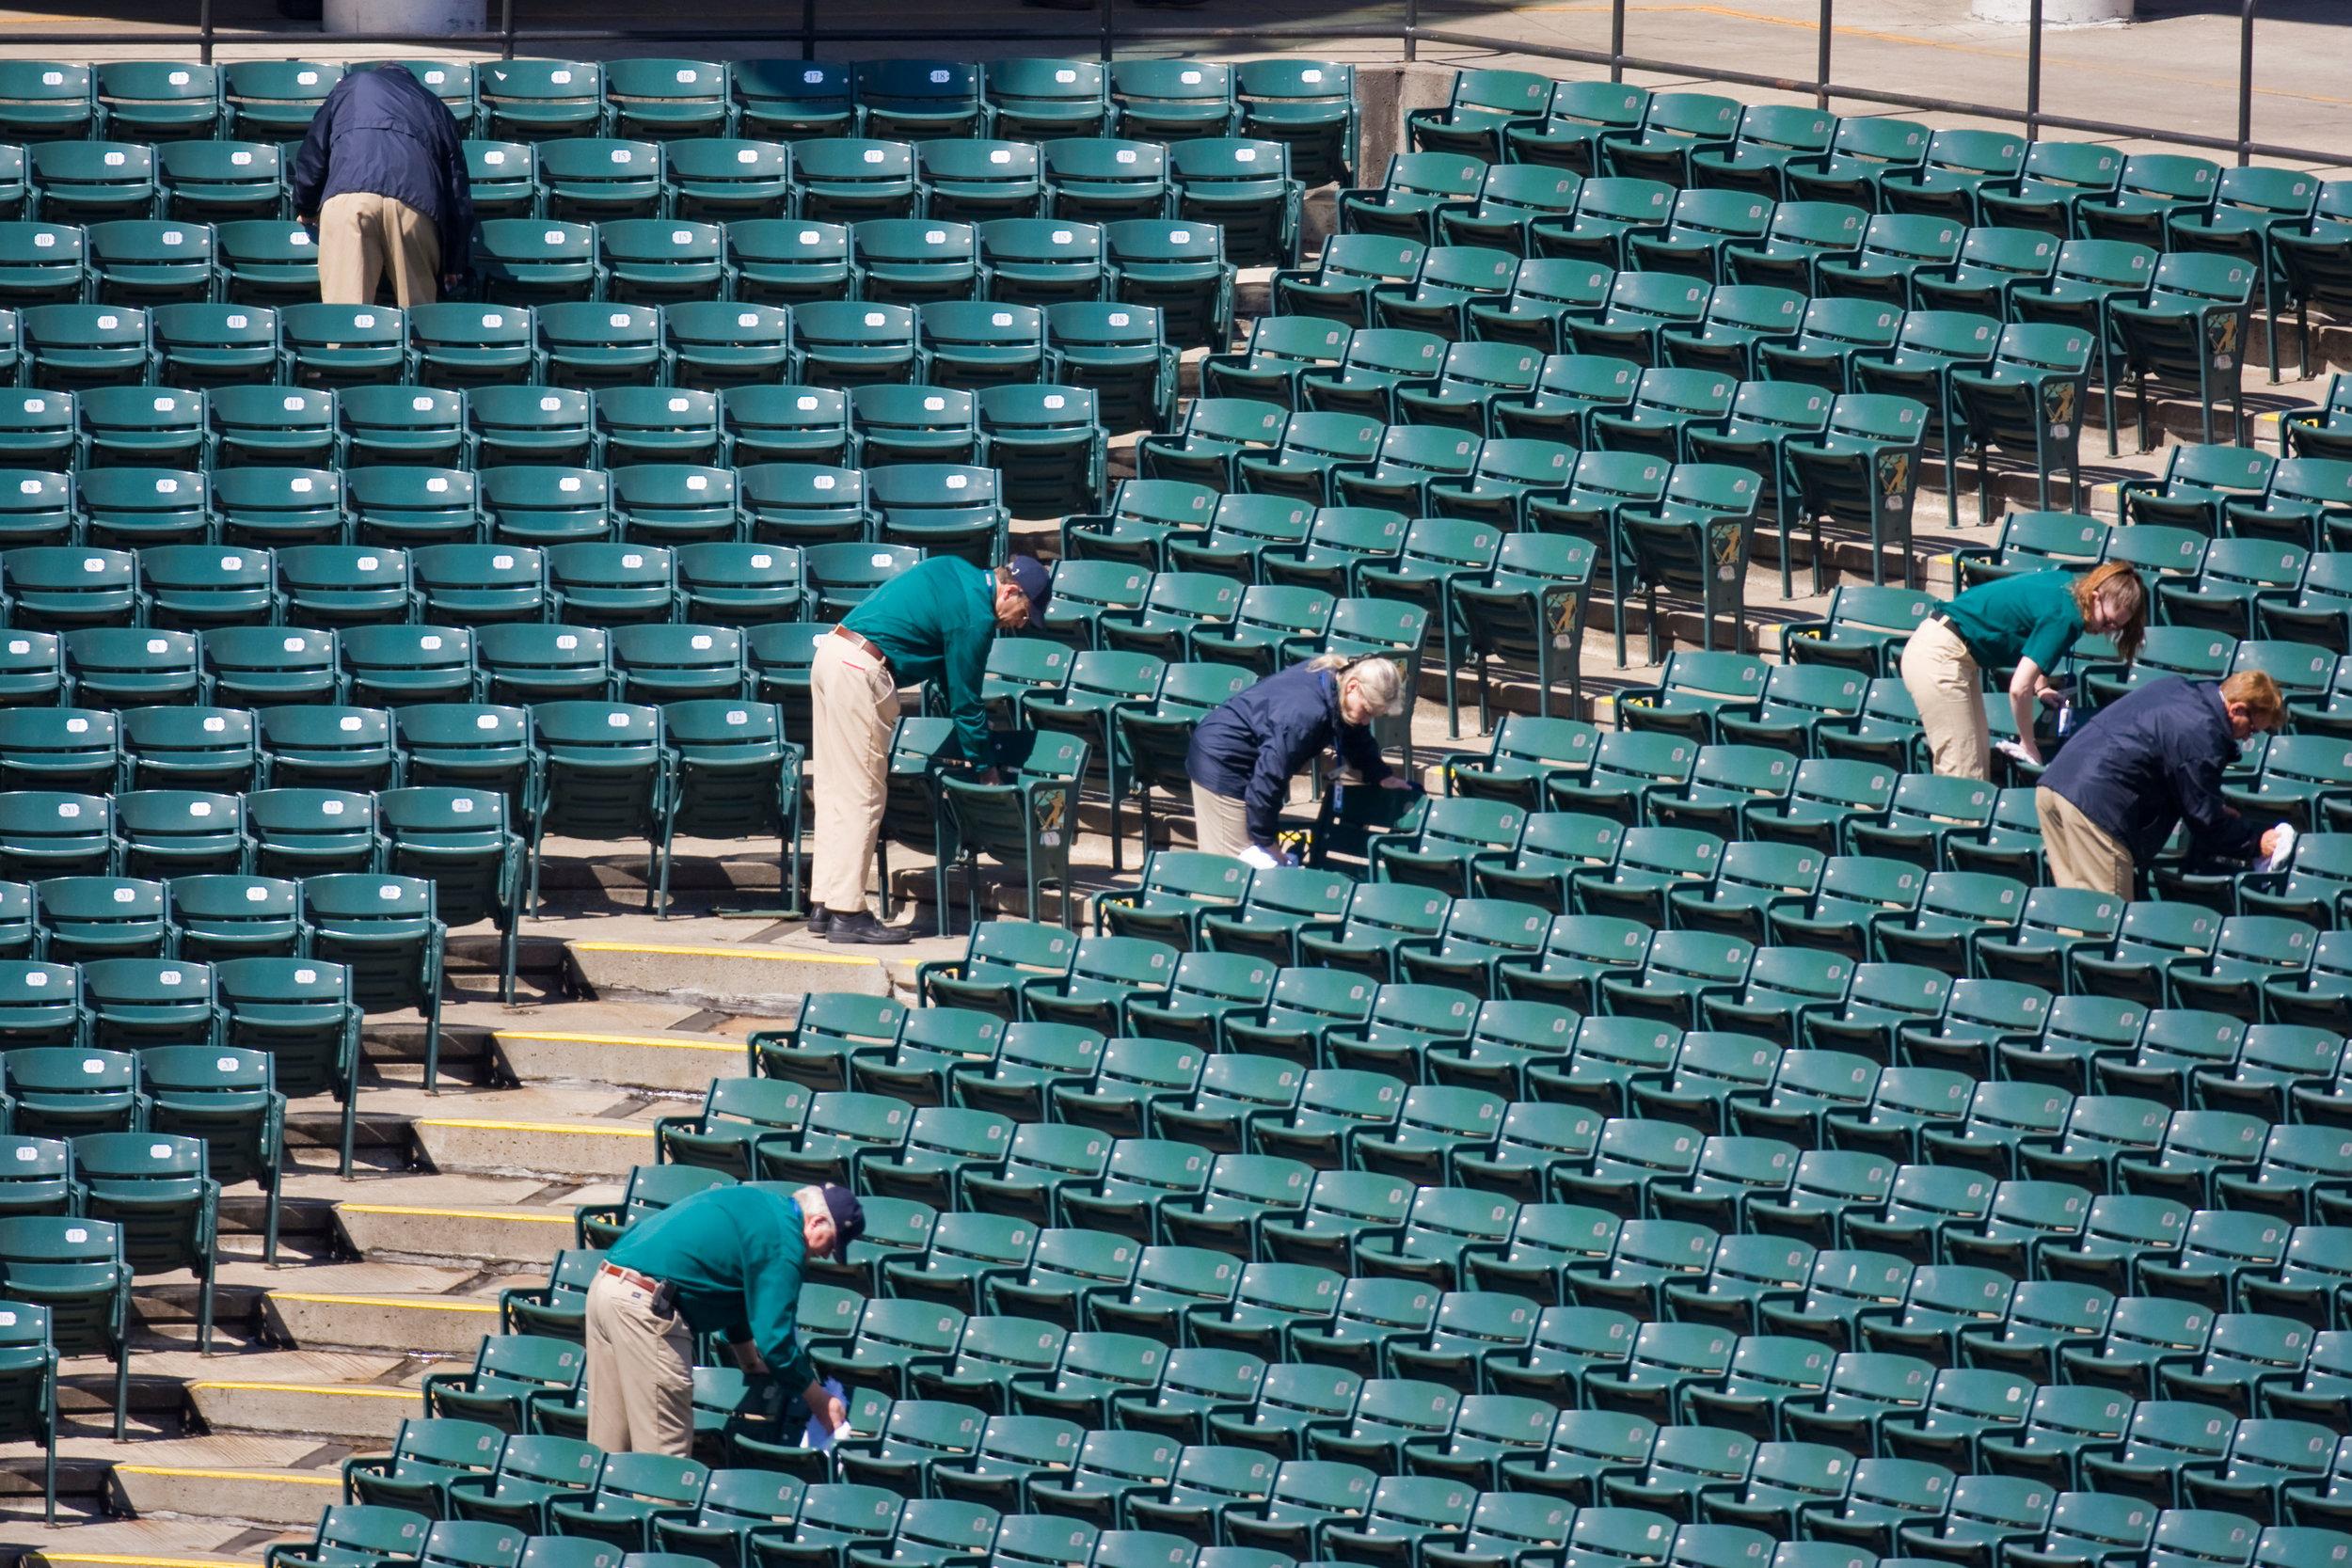 prepost page pic 01 - stadium cleaning.jpg